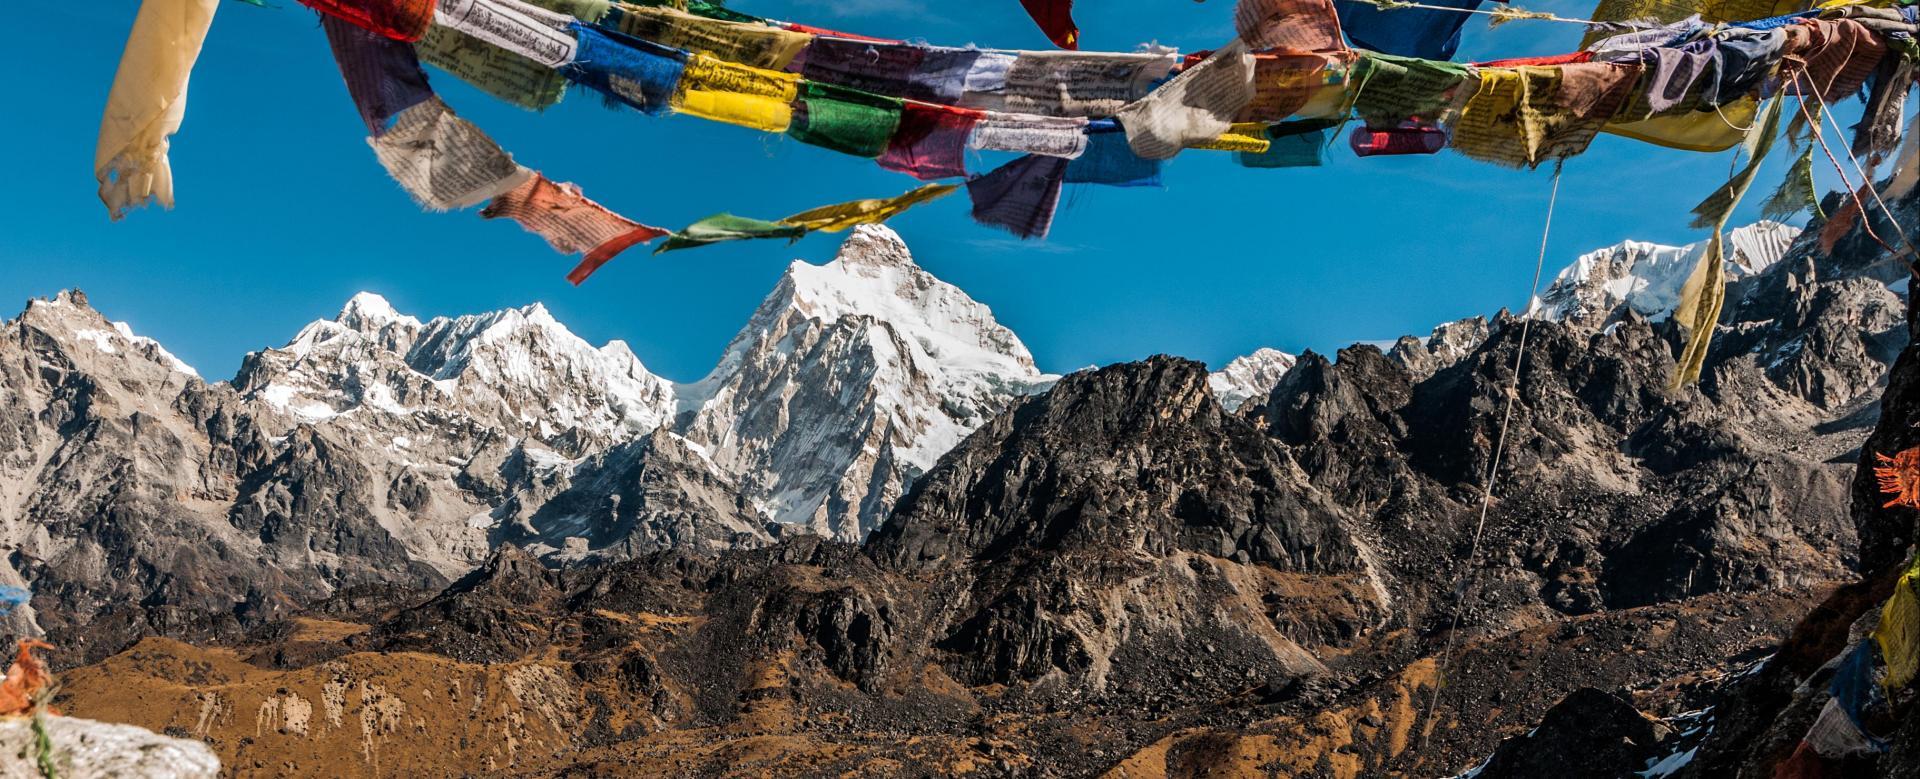 Voyage à pied : Trekking du kangchenjunga (8586 m)